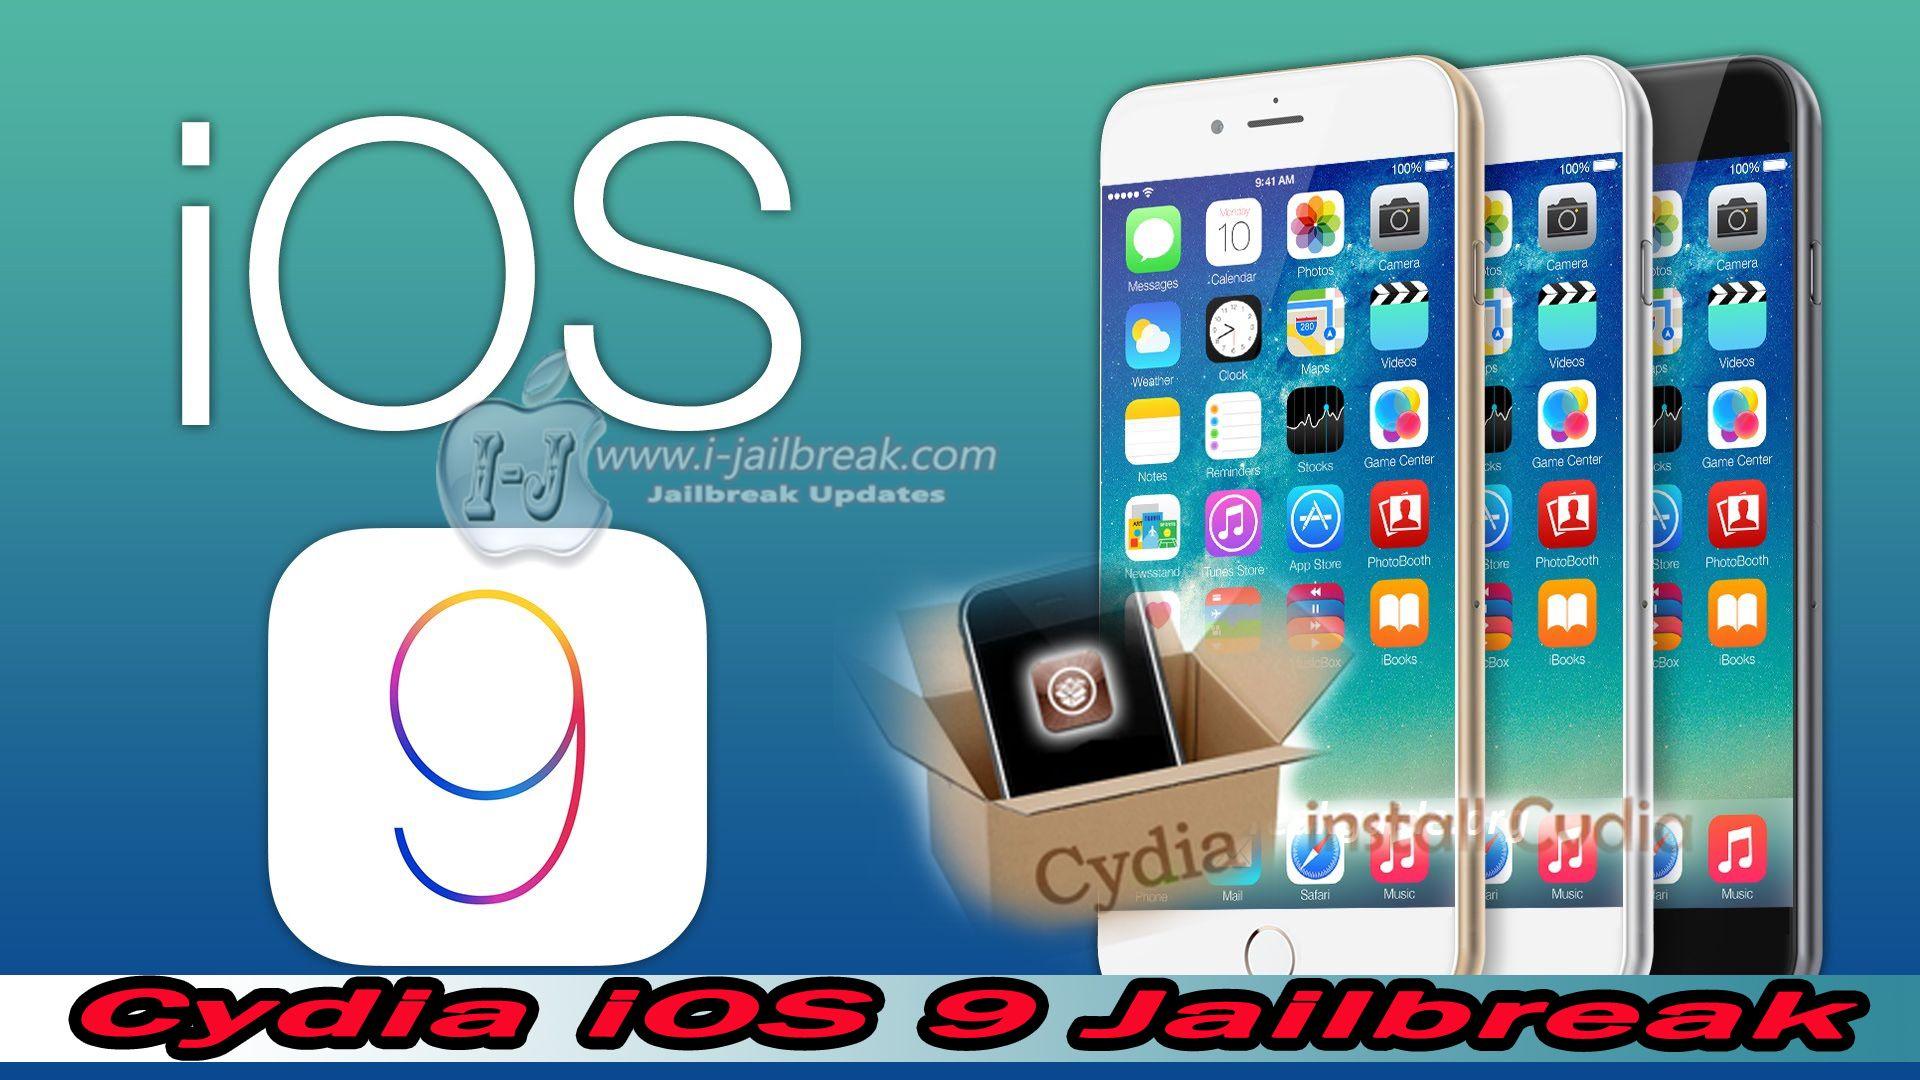 Cydia iOS 9 Jailbreak New ios, Ipod touch, Iphone